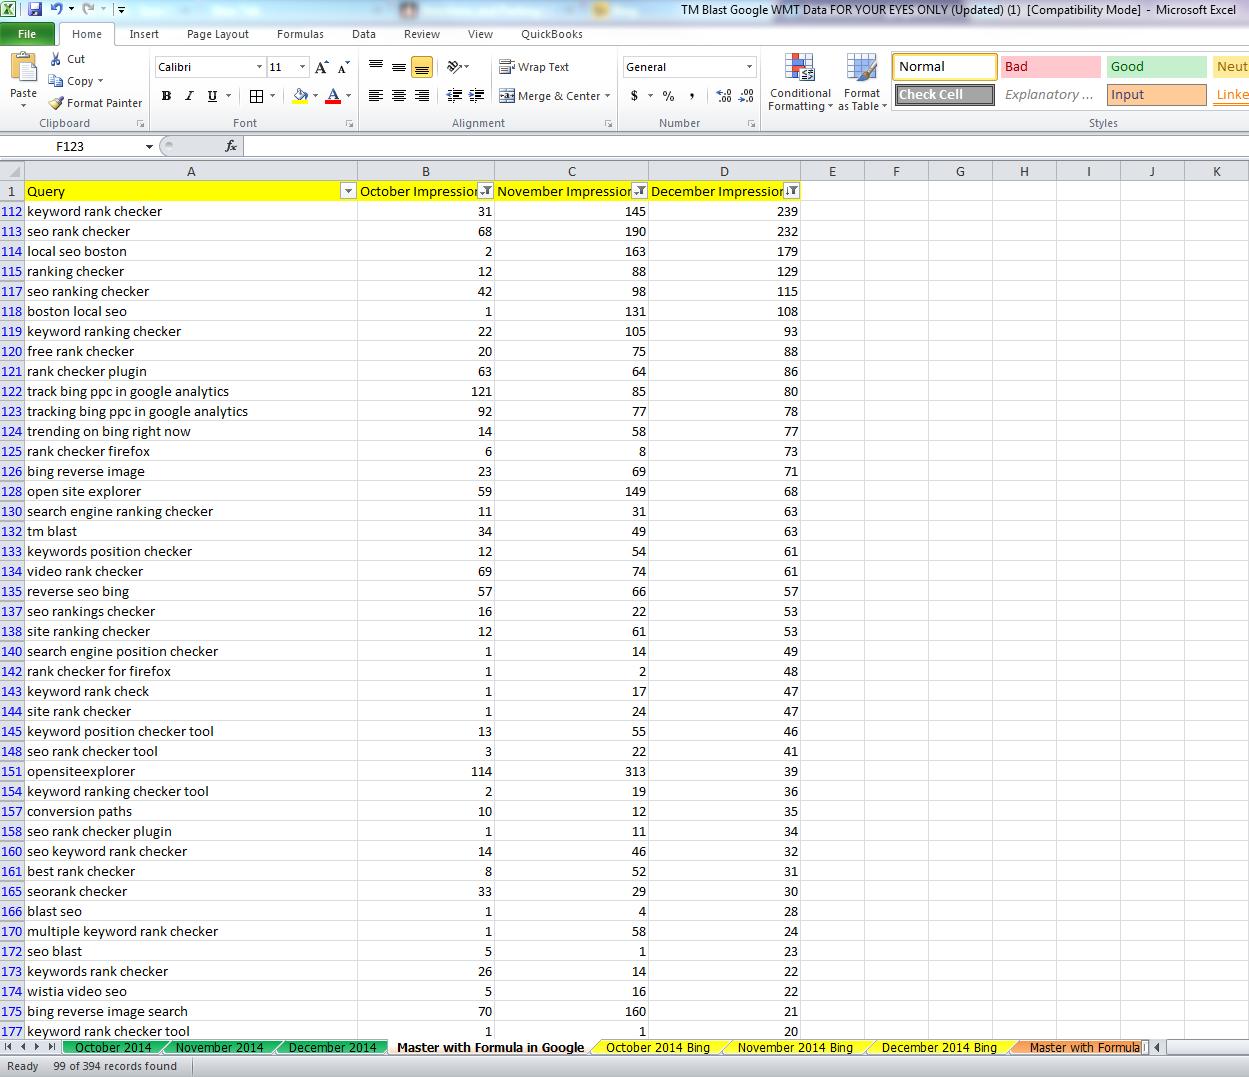 Keyword Ranking Improvements in Google WMT